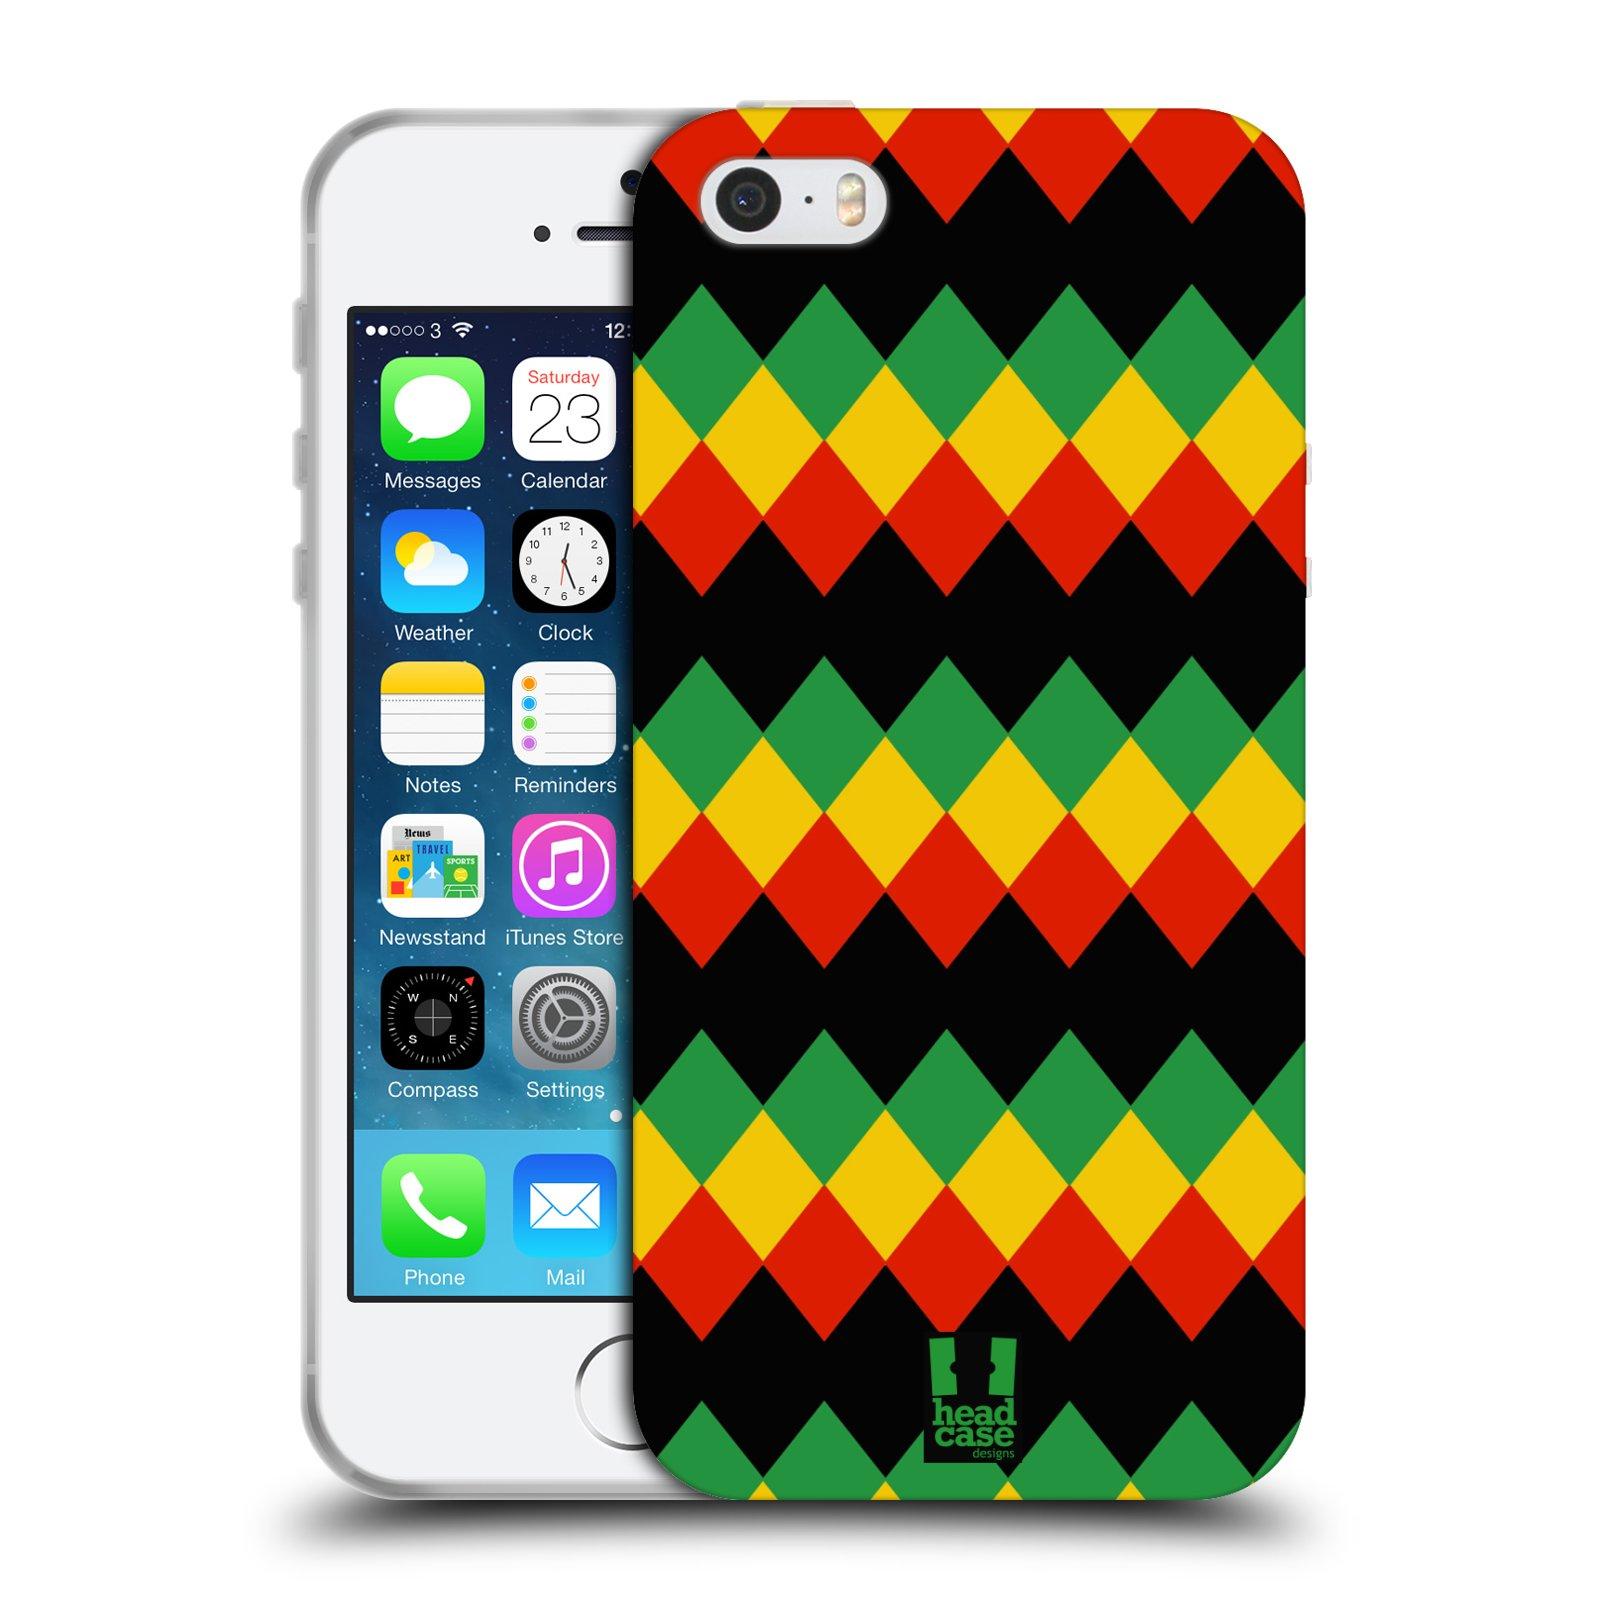 HEAD CASE silikonový obal na mobil Apple Iphone 5/5S vzor Rasta barevné vzory DIAMANT